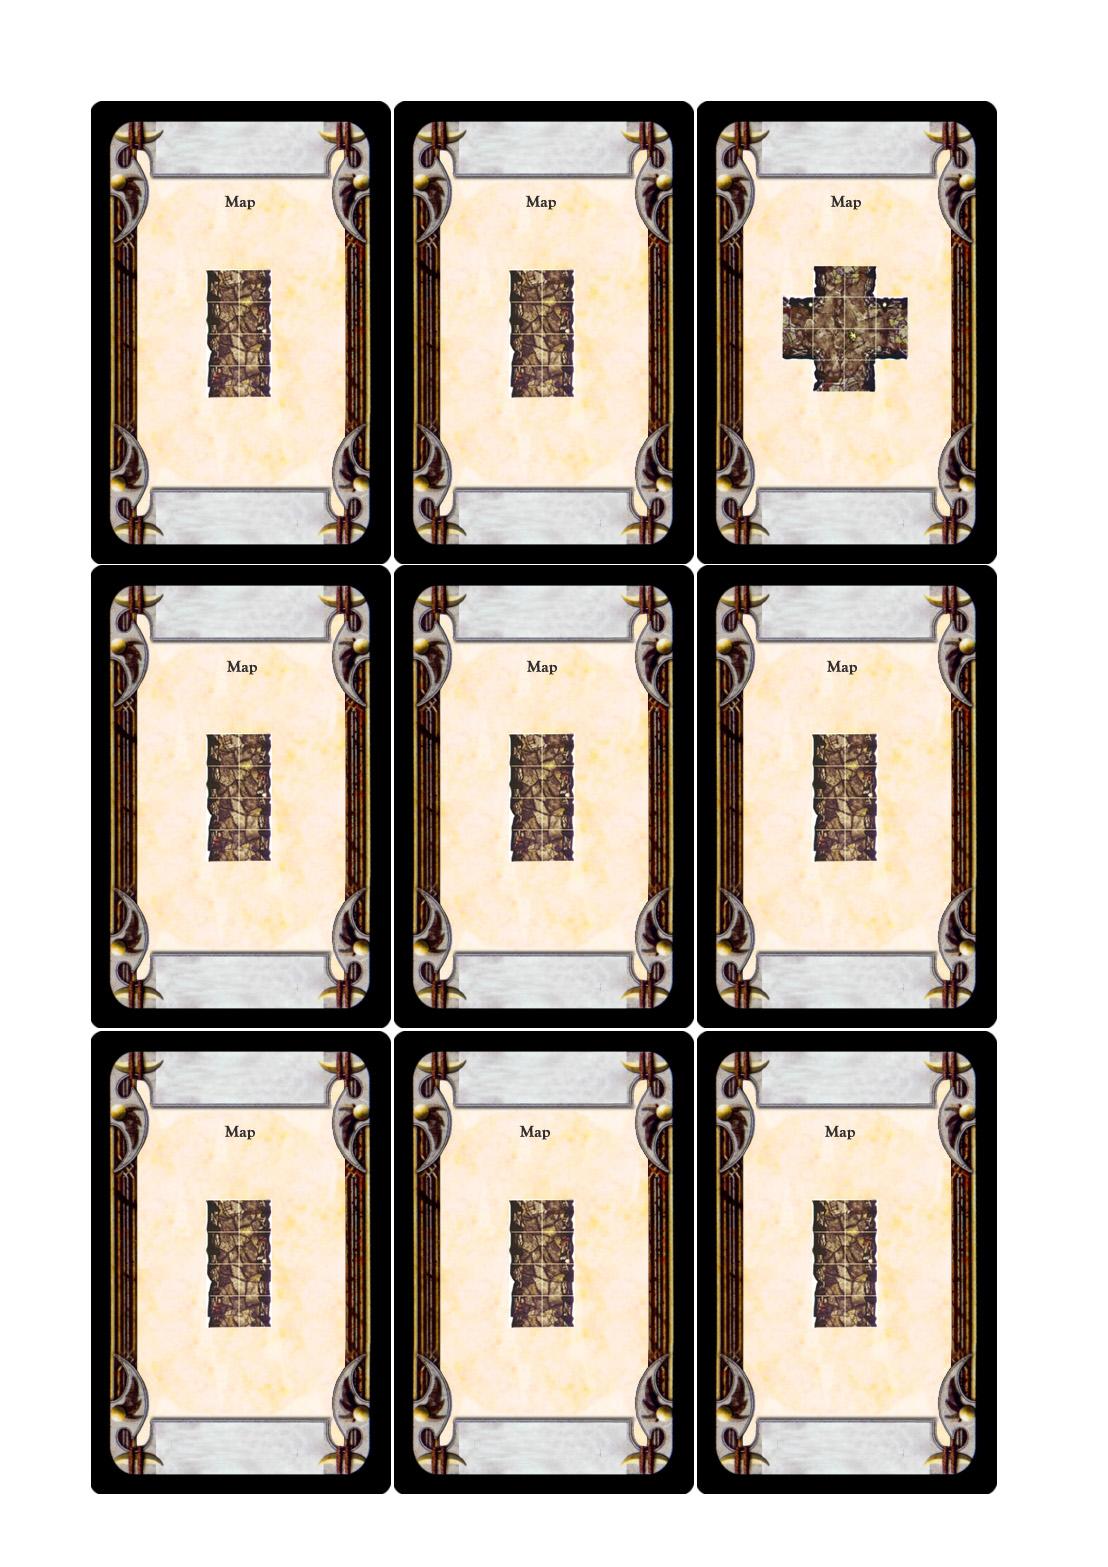 This is an image of Comprehensive Printable Sabacc Deck